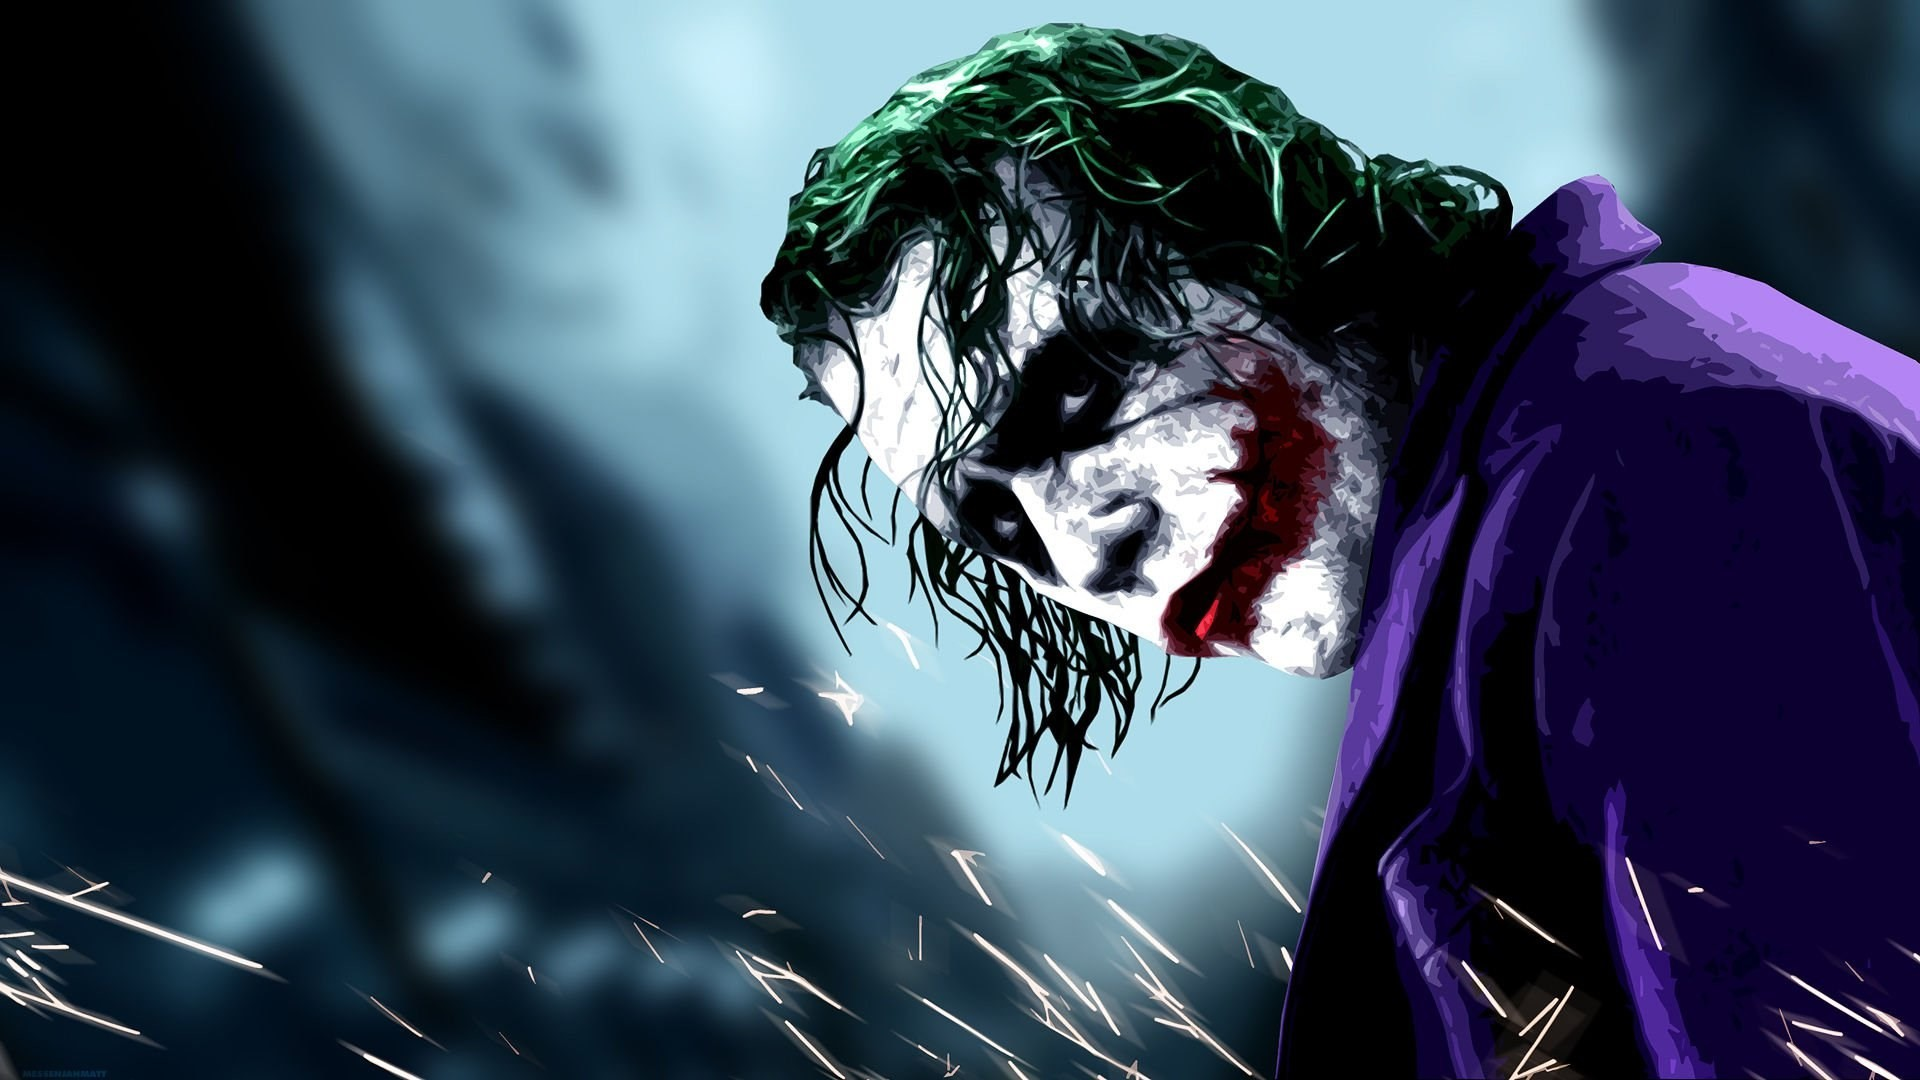 Joker Background 74 pictures 1920x1080